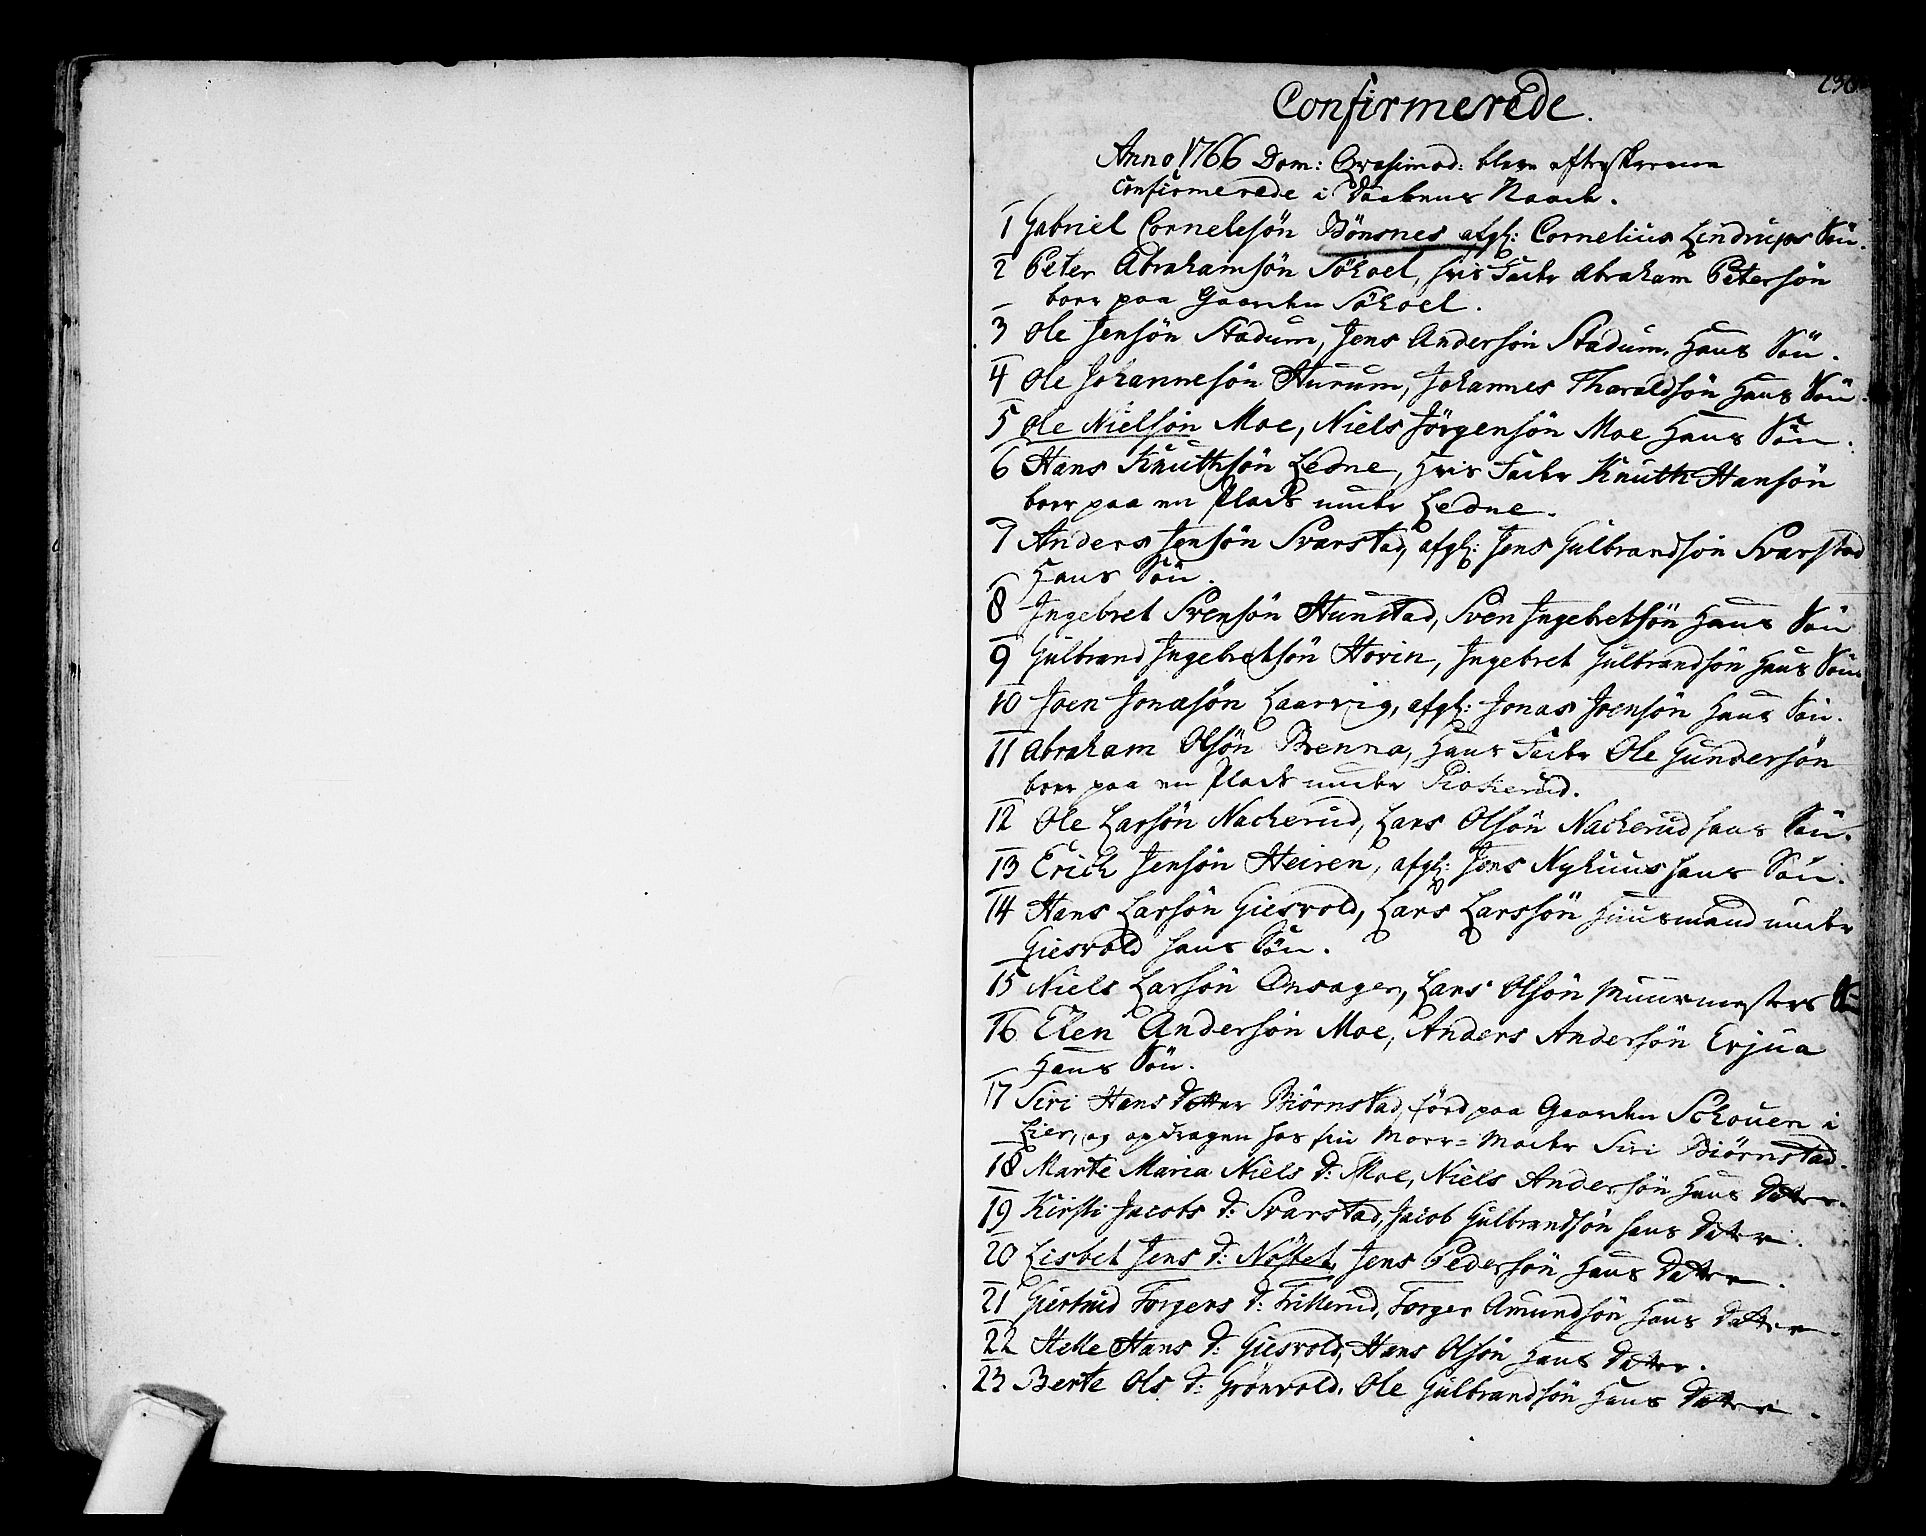 SAKO, Hole kirkebøker, F/Fa/L0002: Ministerialbok nr. I 2, 1766-1814, s. 238